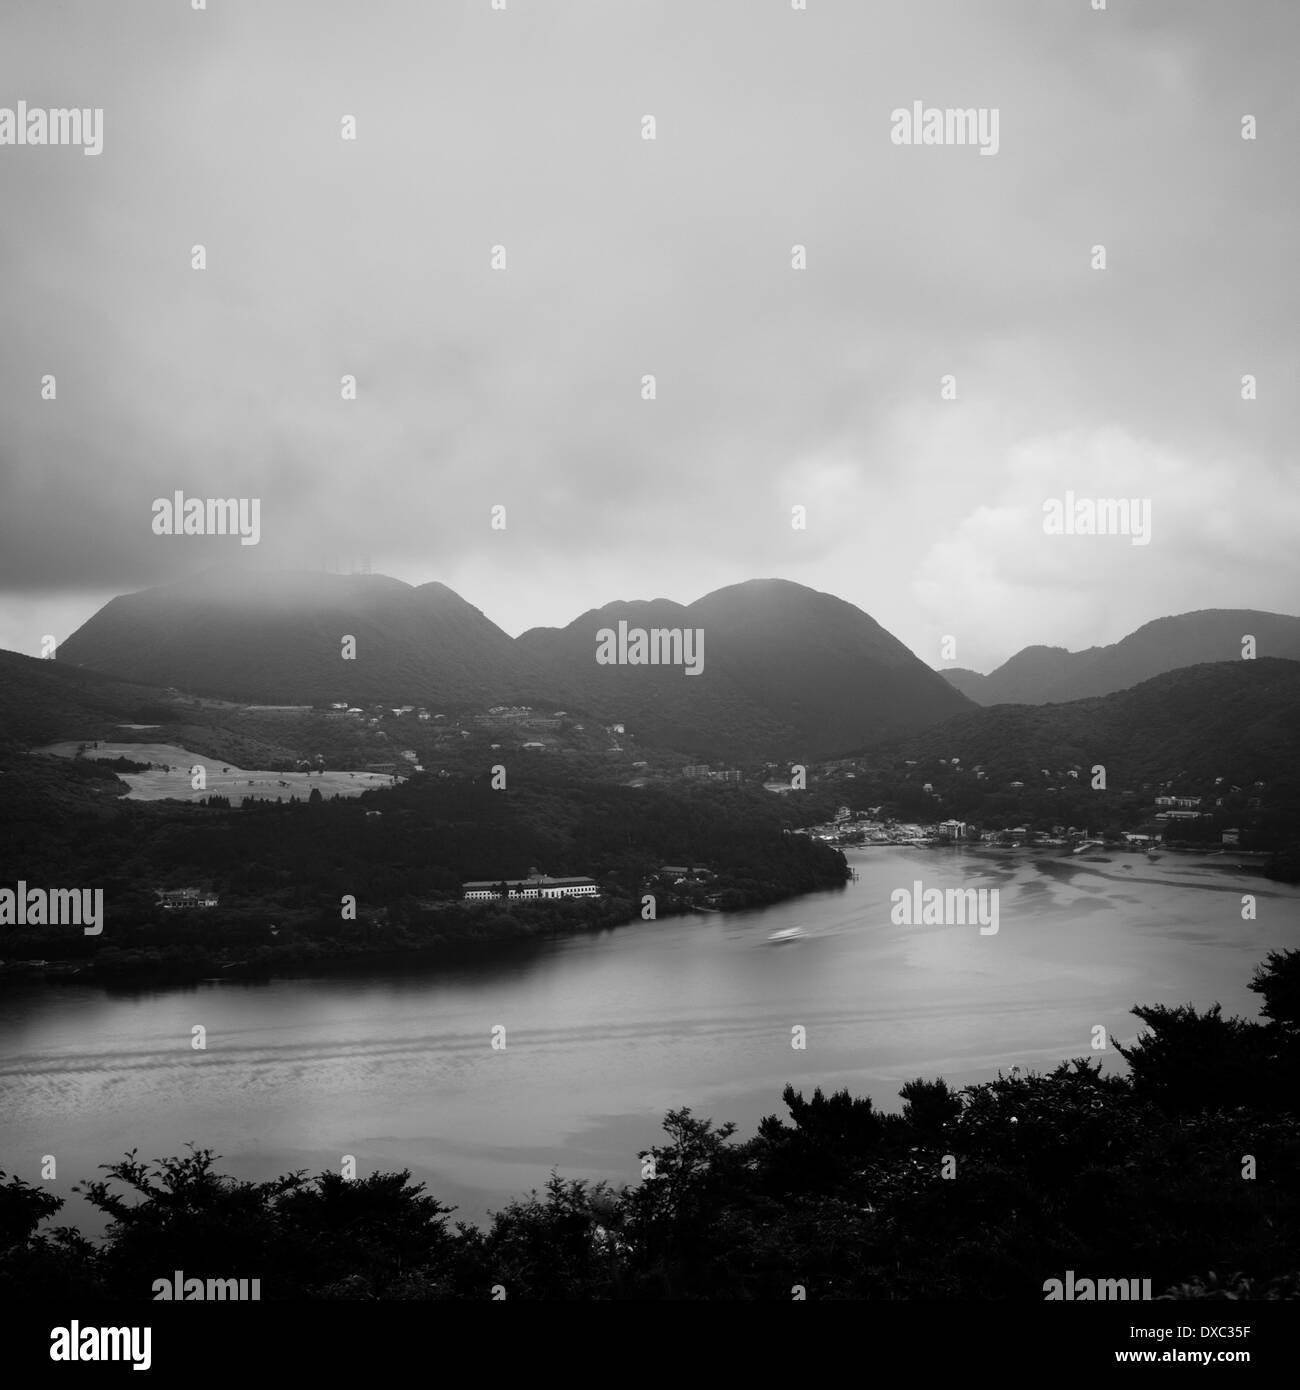 View From Ashinoko Skyline, Hakone, Kanagawa Prefecture, Japan - Stock Image